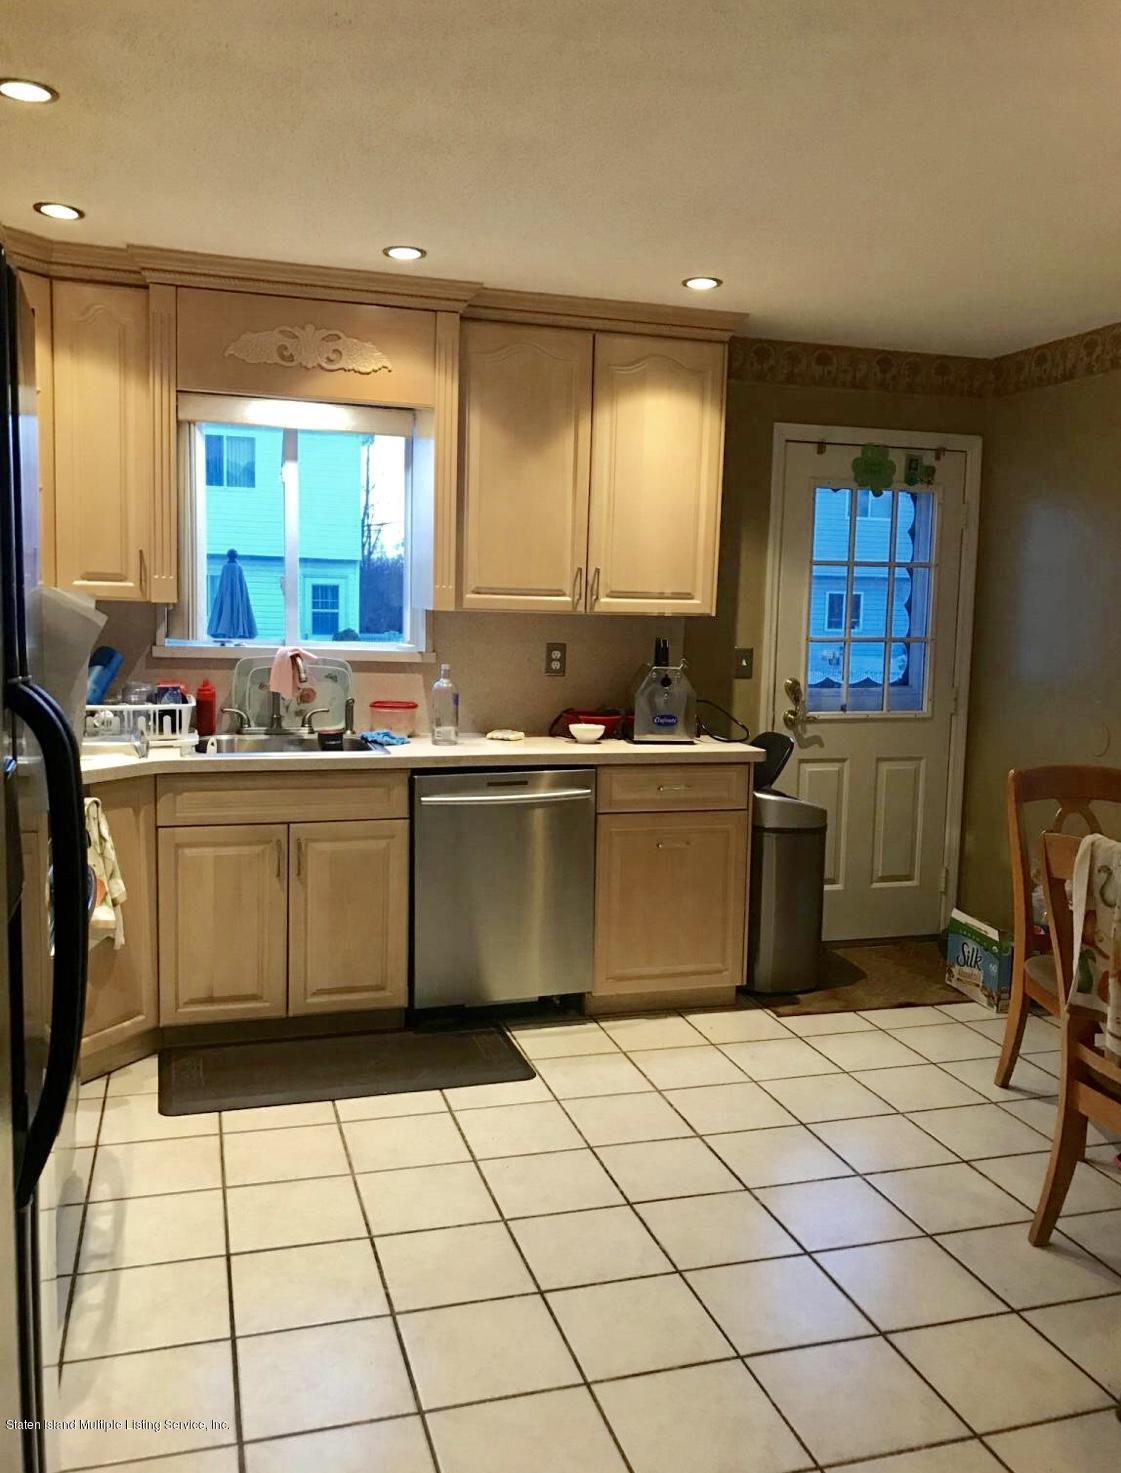 Single Family - Semi-Attached 122 Winfield Street  Staten Island, NY 10305, MLS-1131080-2